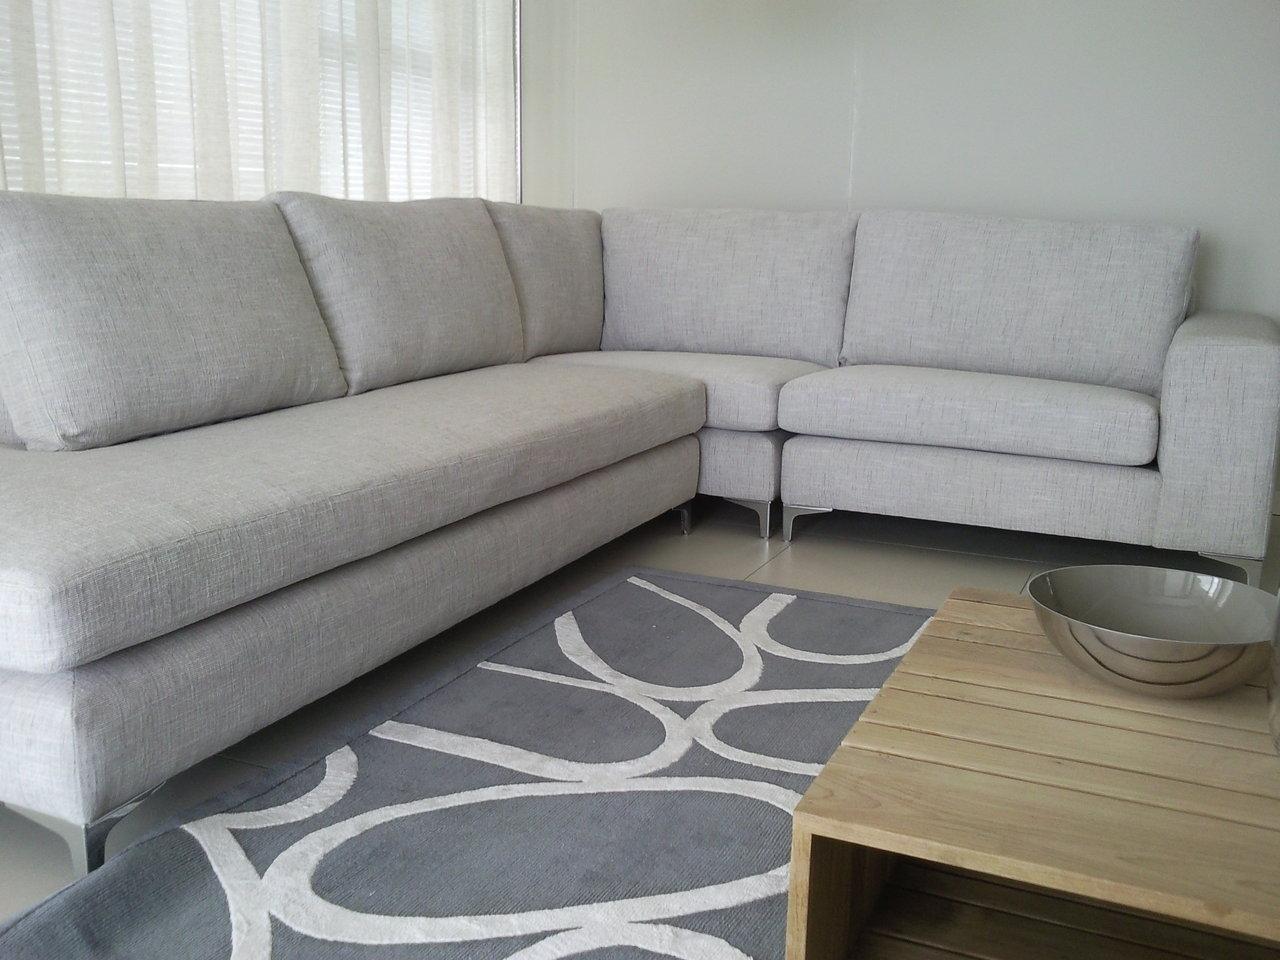 Mark Miller Furniture Design | Couch